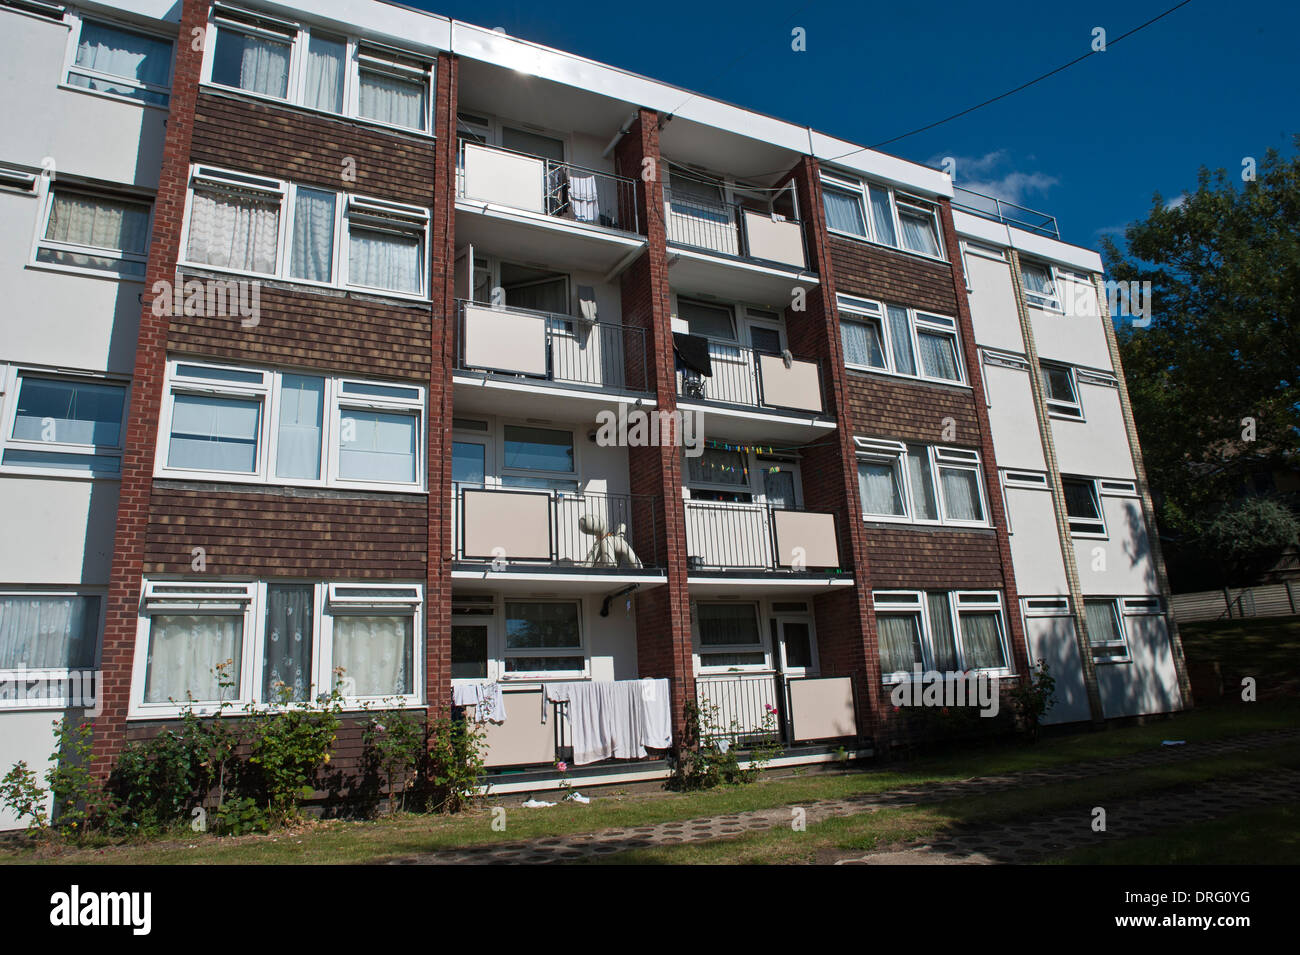 Buy My Housing Association Property